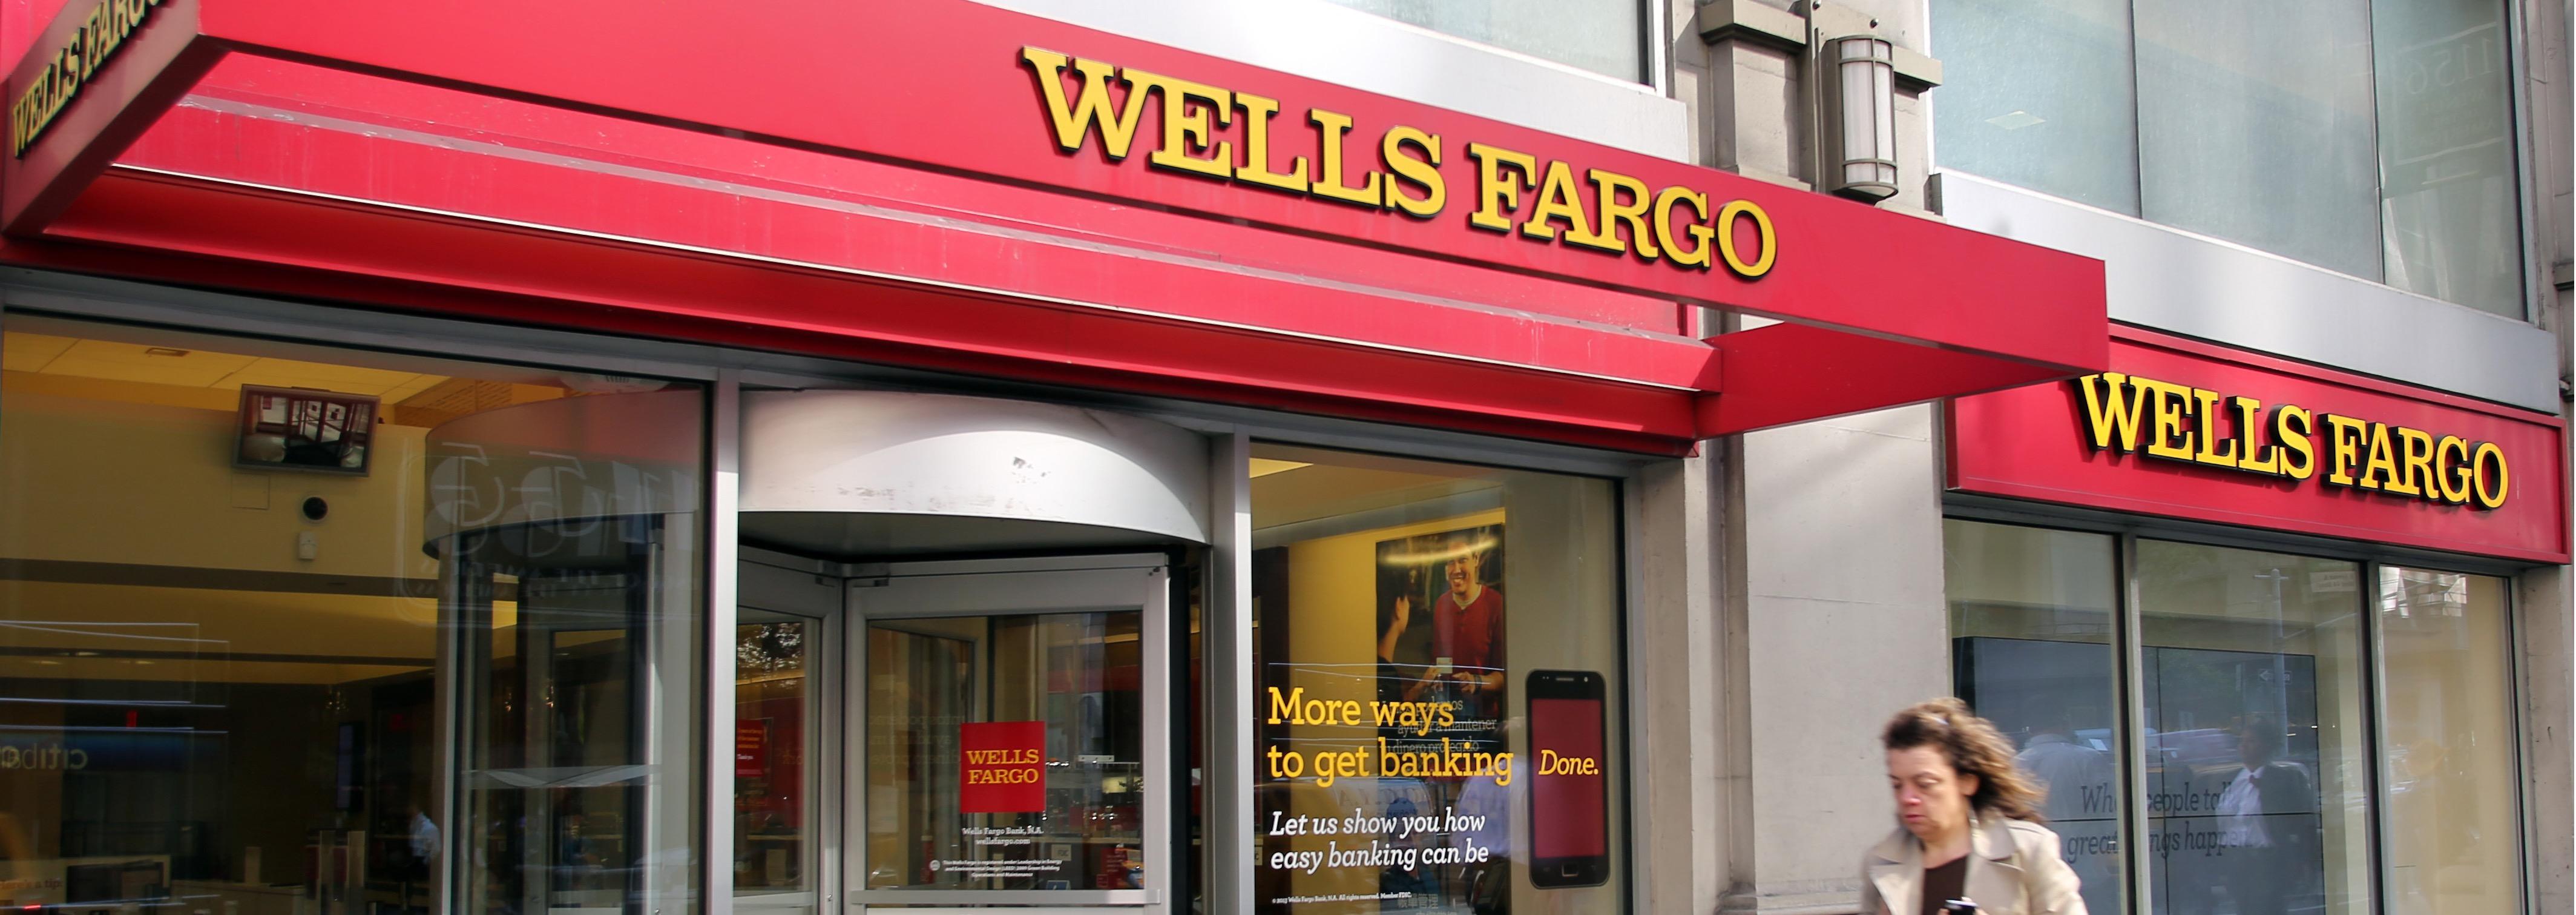 Wells Fargo Consumer Fraud Scandal: Bank Pays Big Fine for Fake Accounts Hero Image